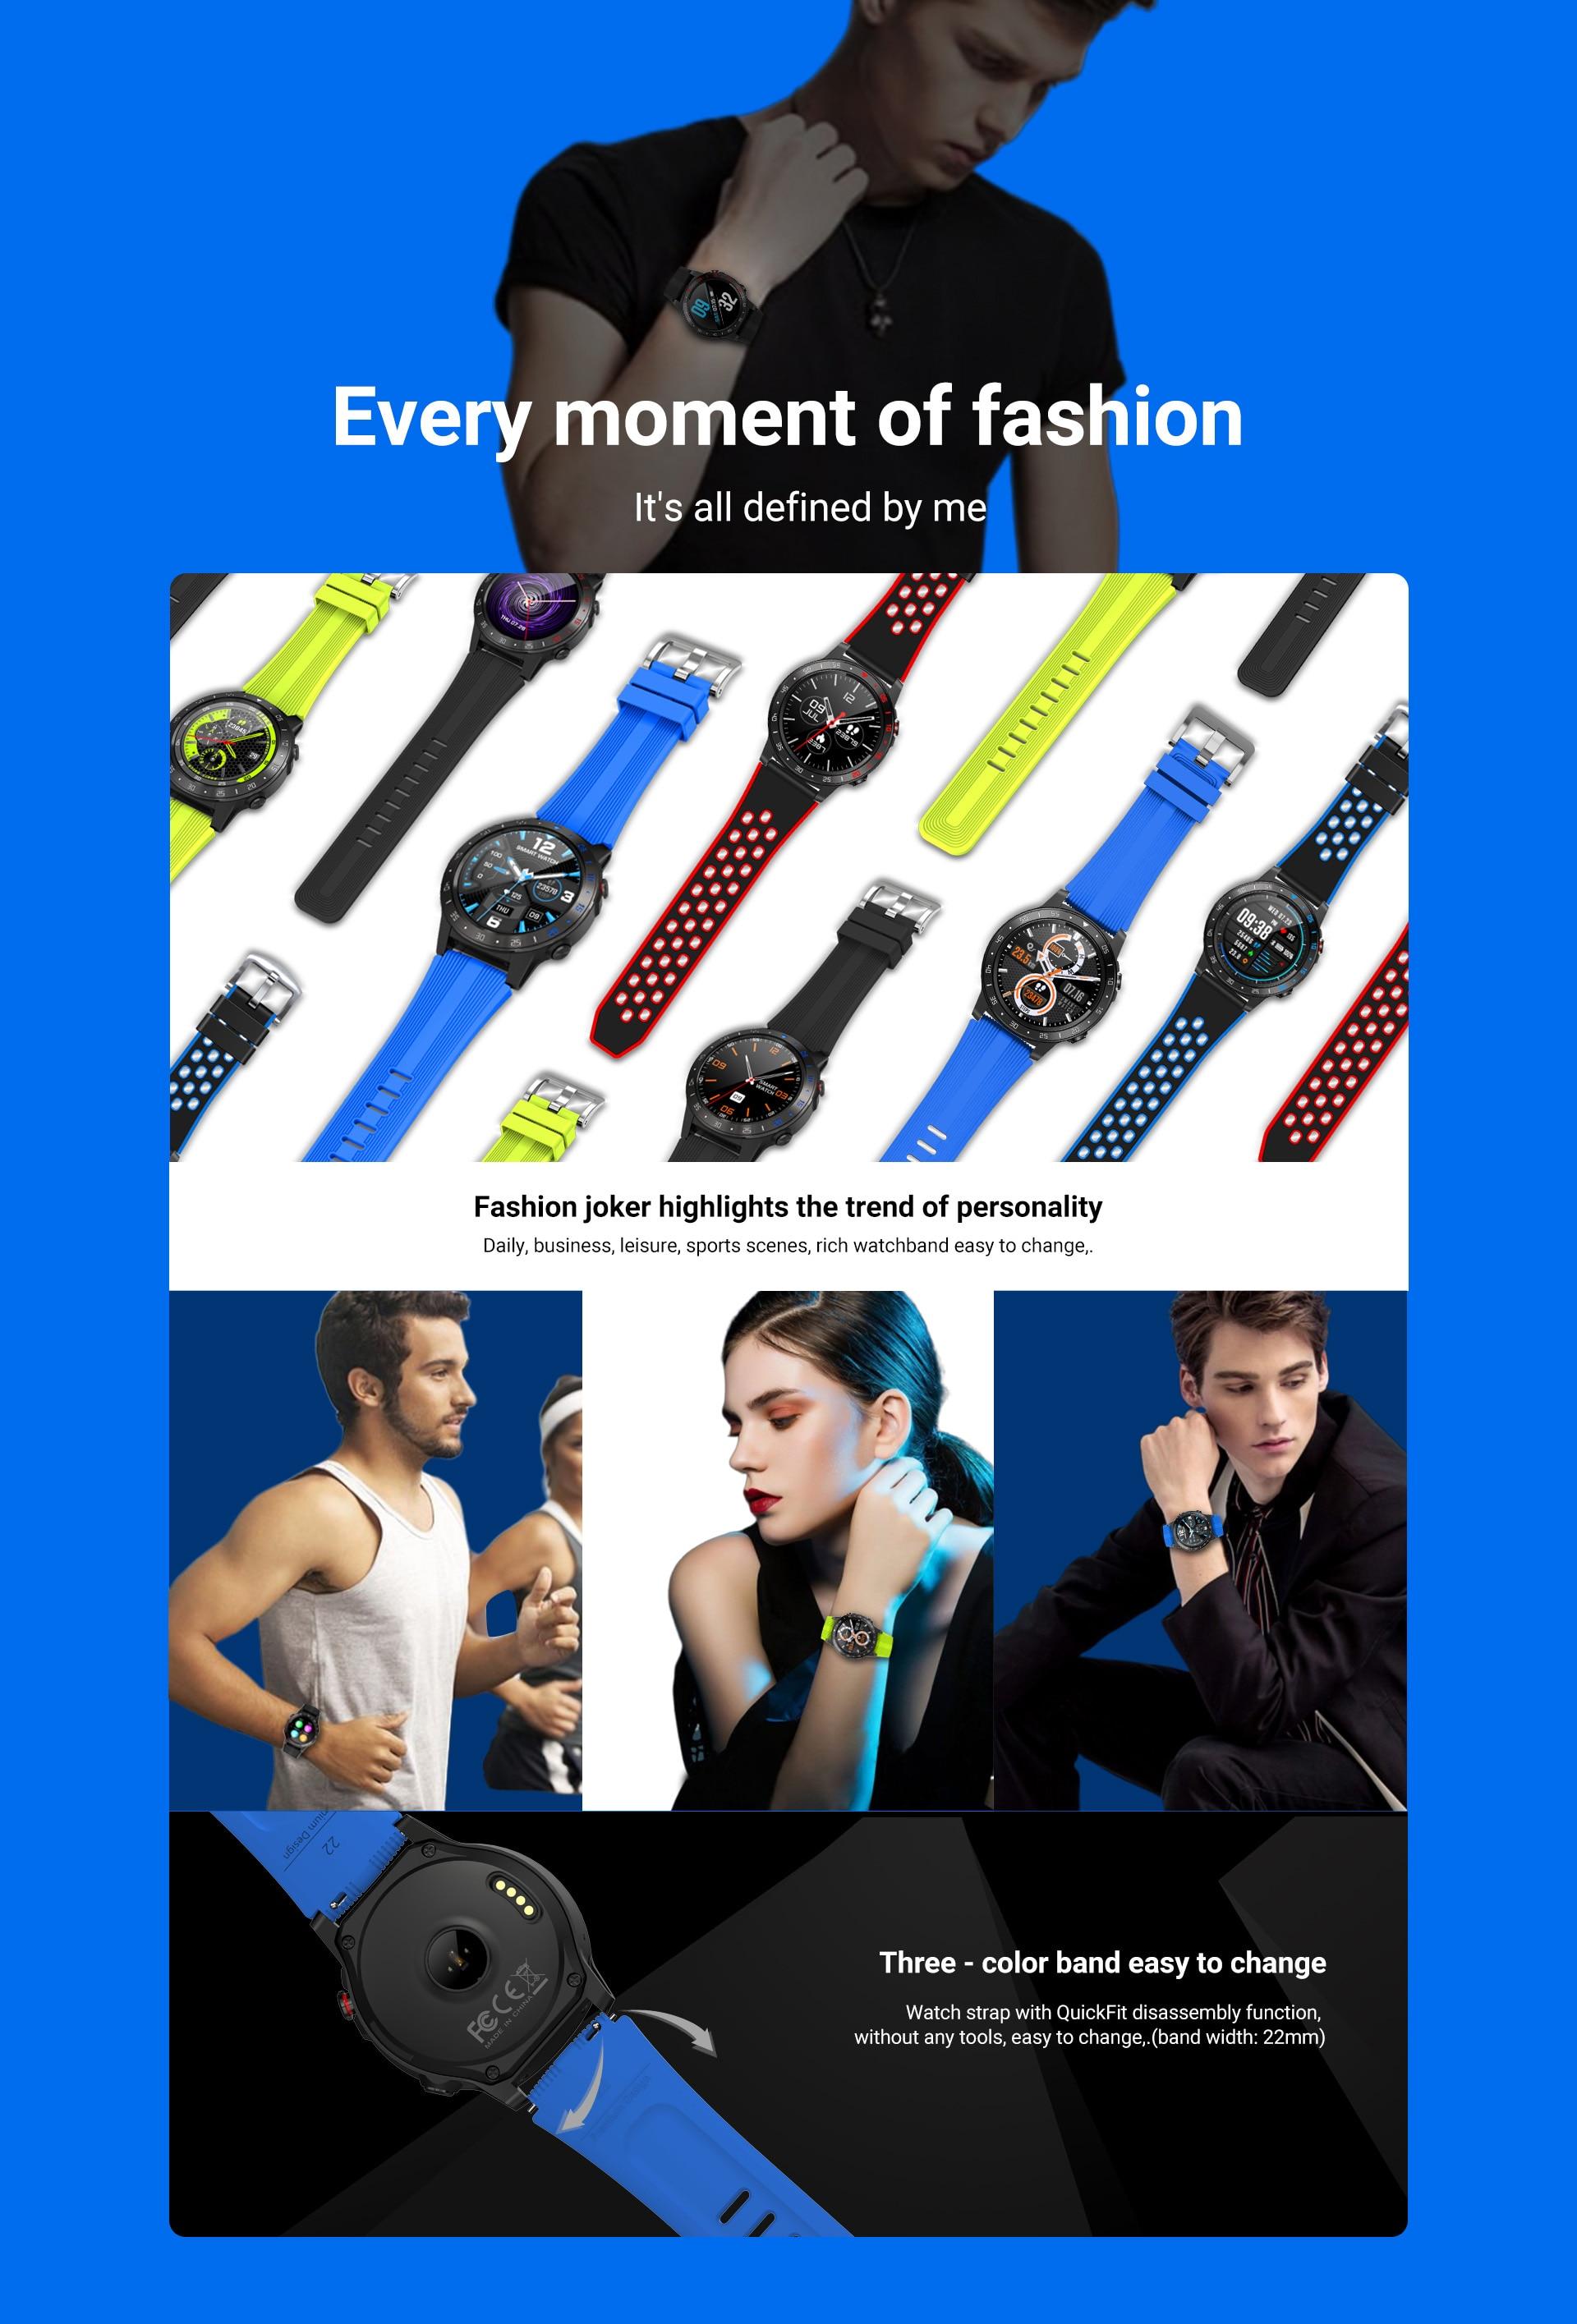 H7c02c87382c743bfa8652c90821f82f75 GPS Smartwatch Men With SIM Card Fitness Compass Barometer Altitude M5 Mi Smart Watch Men Women 2021 for Android Xiaomi